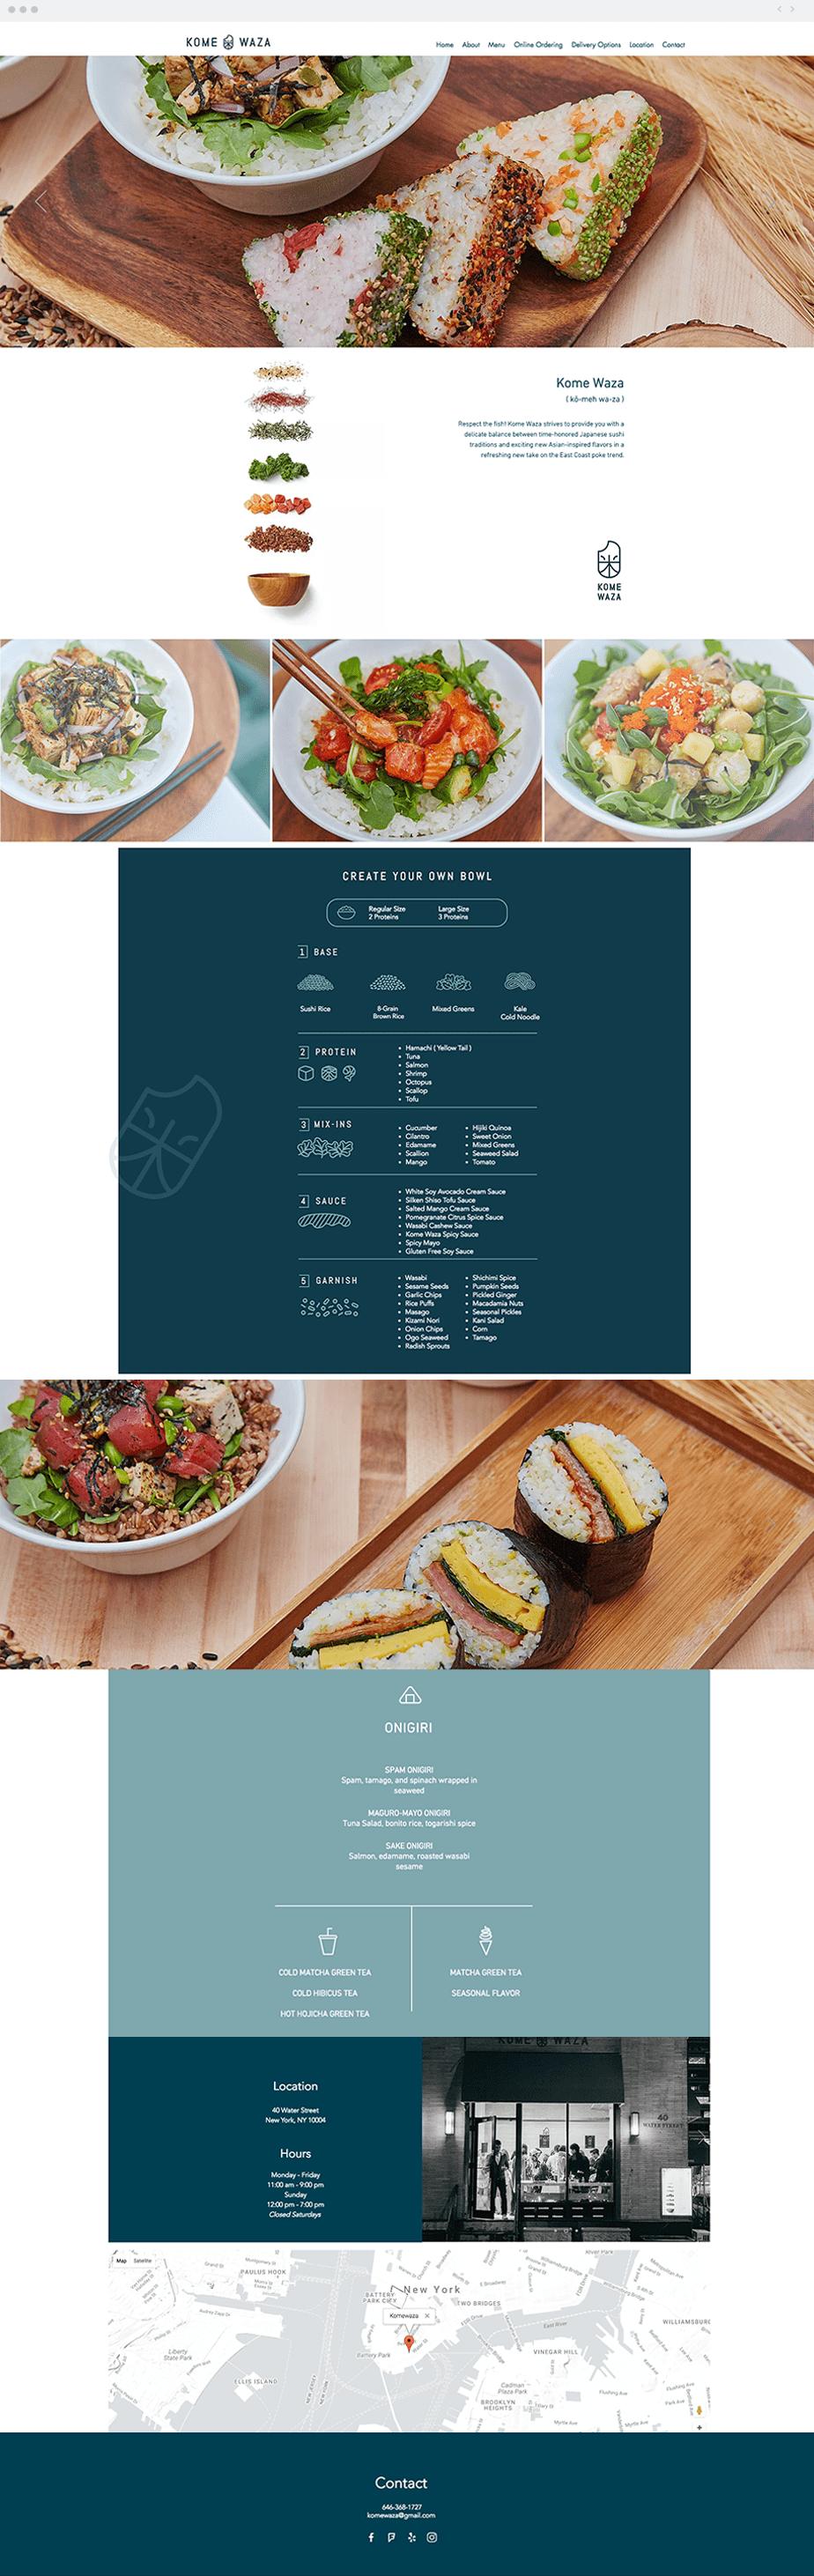 Restaurant Website - Kome Waza